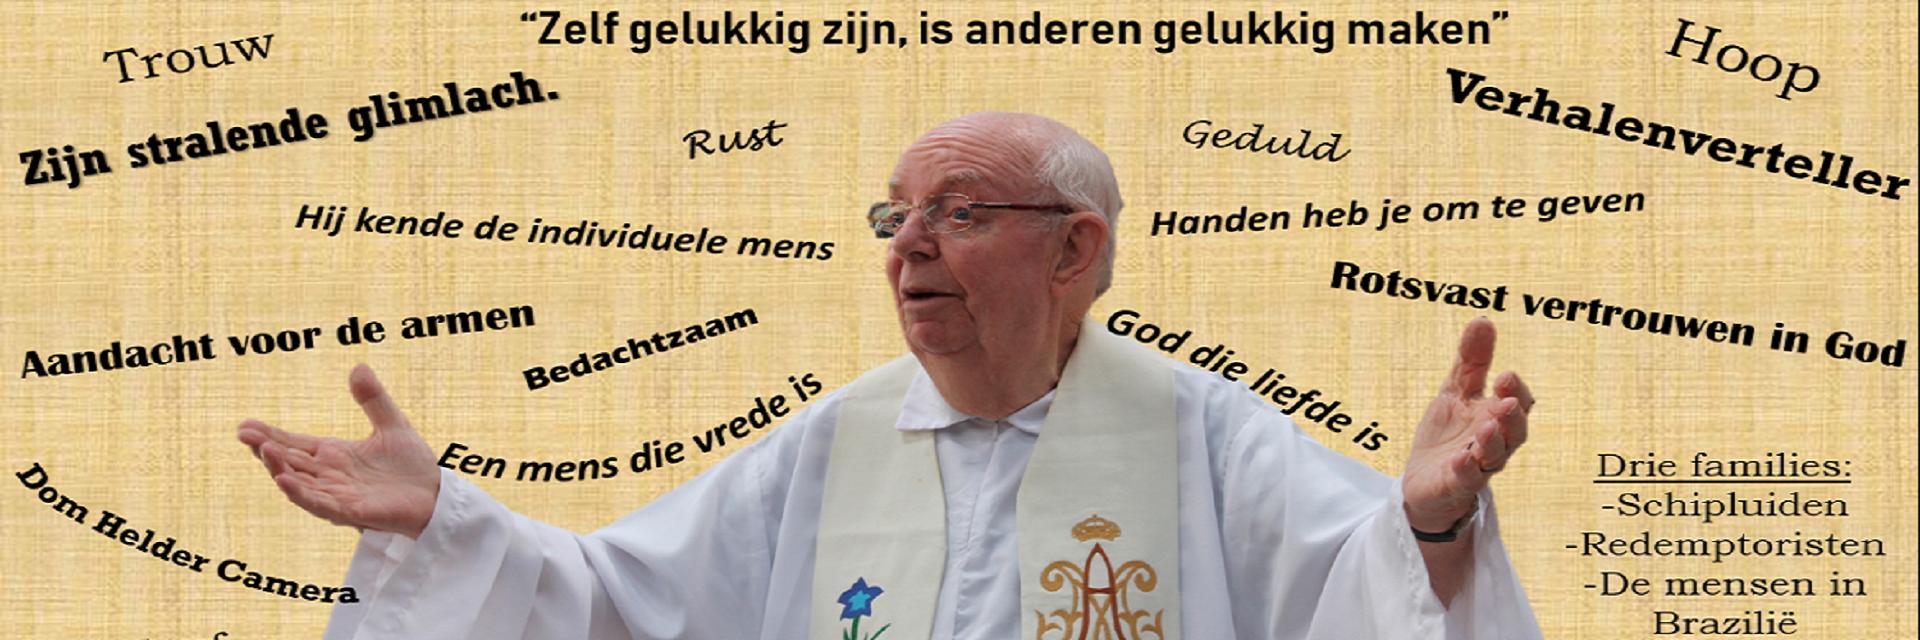 Pater Gabriël